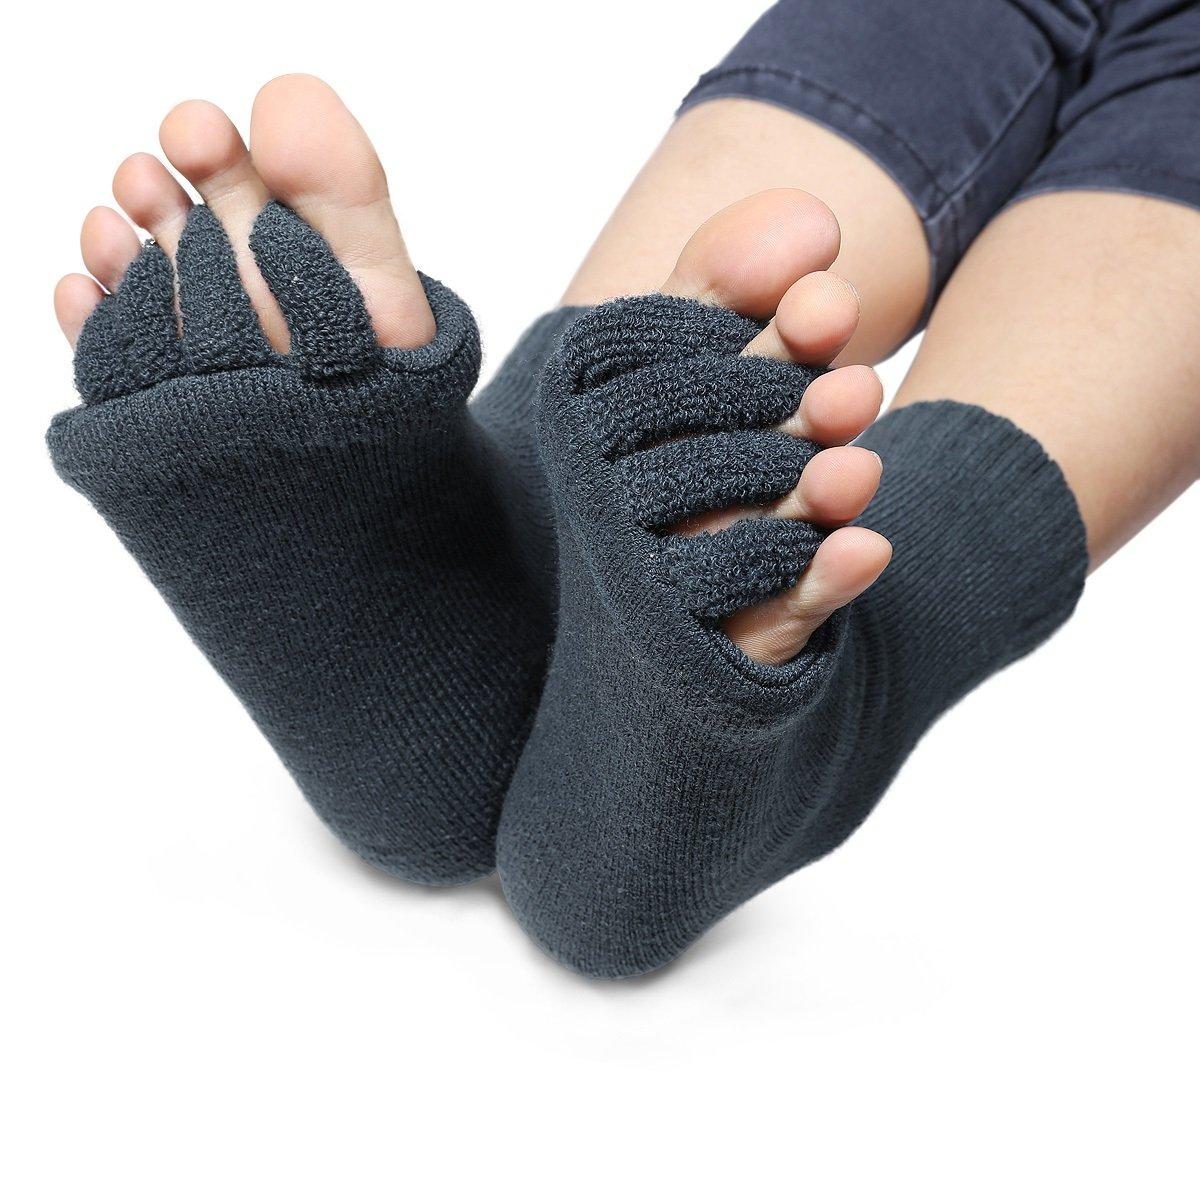 DevsWear Alignment Socks Open Toe Separator Spacer Pain Relief Yoga Gym Pedicure (NavyBlue - 1 Pair, Medium)